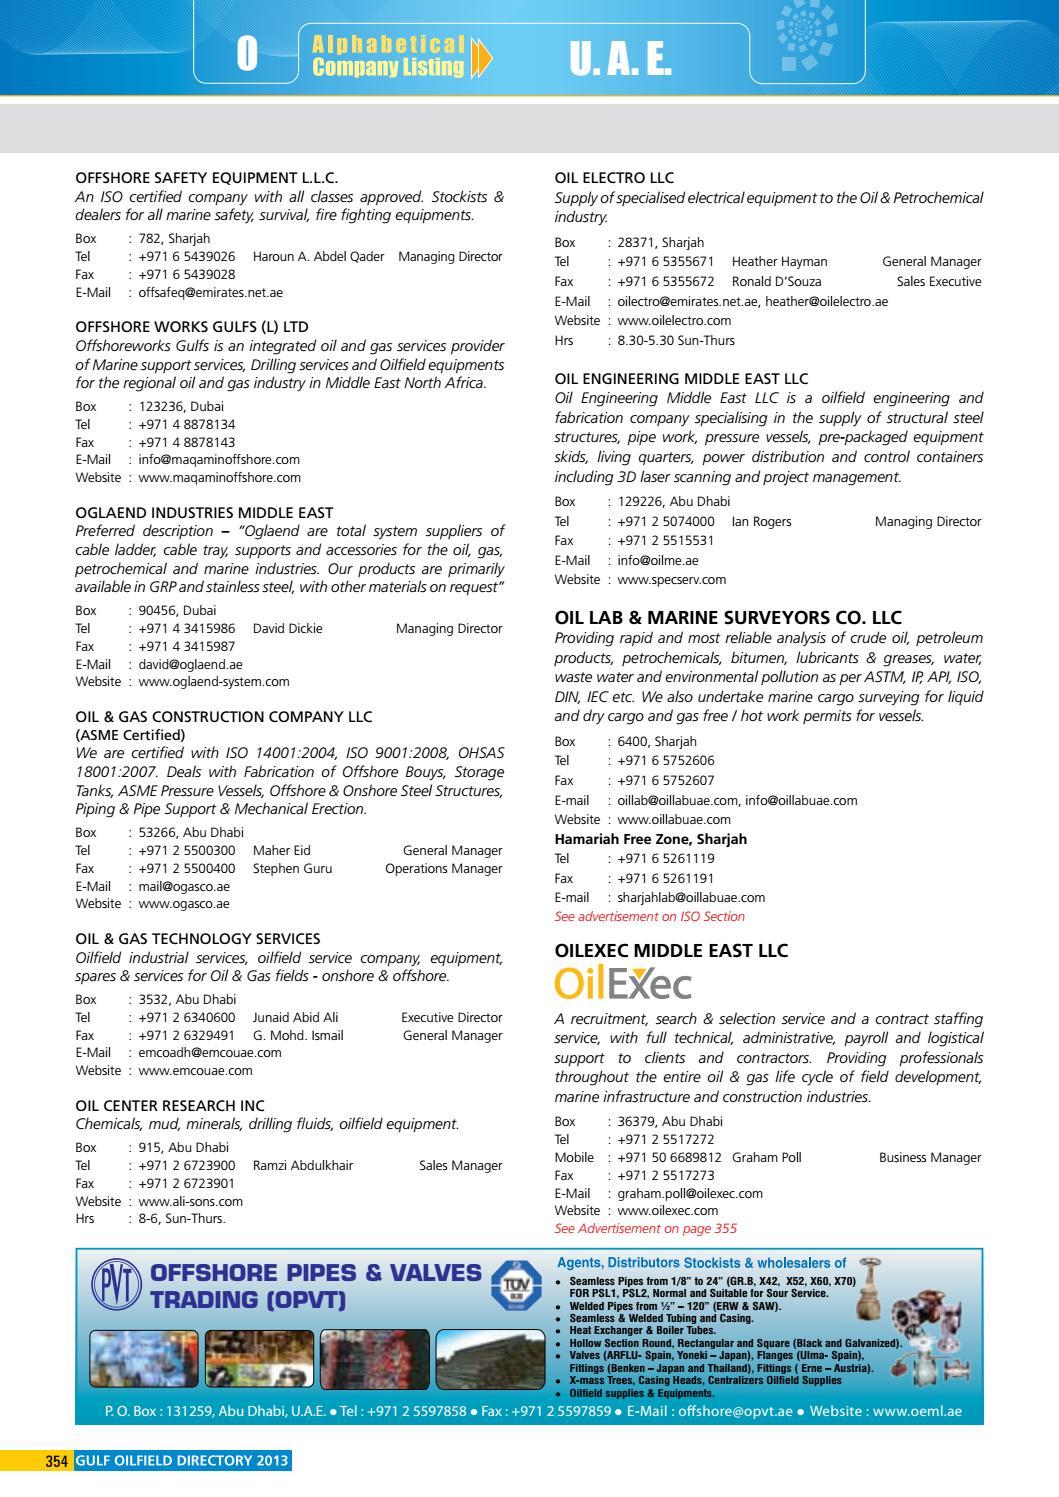 Gulf Oilfield Directory 2013 Edition by Sven Boermeester - issuu